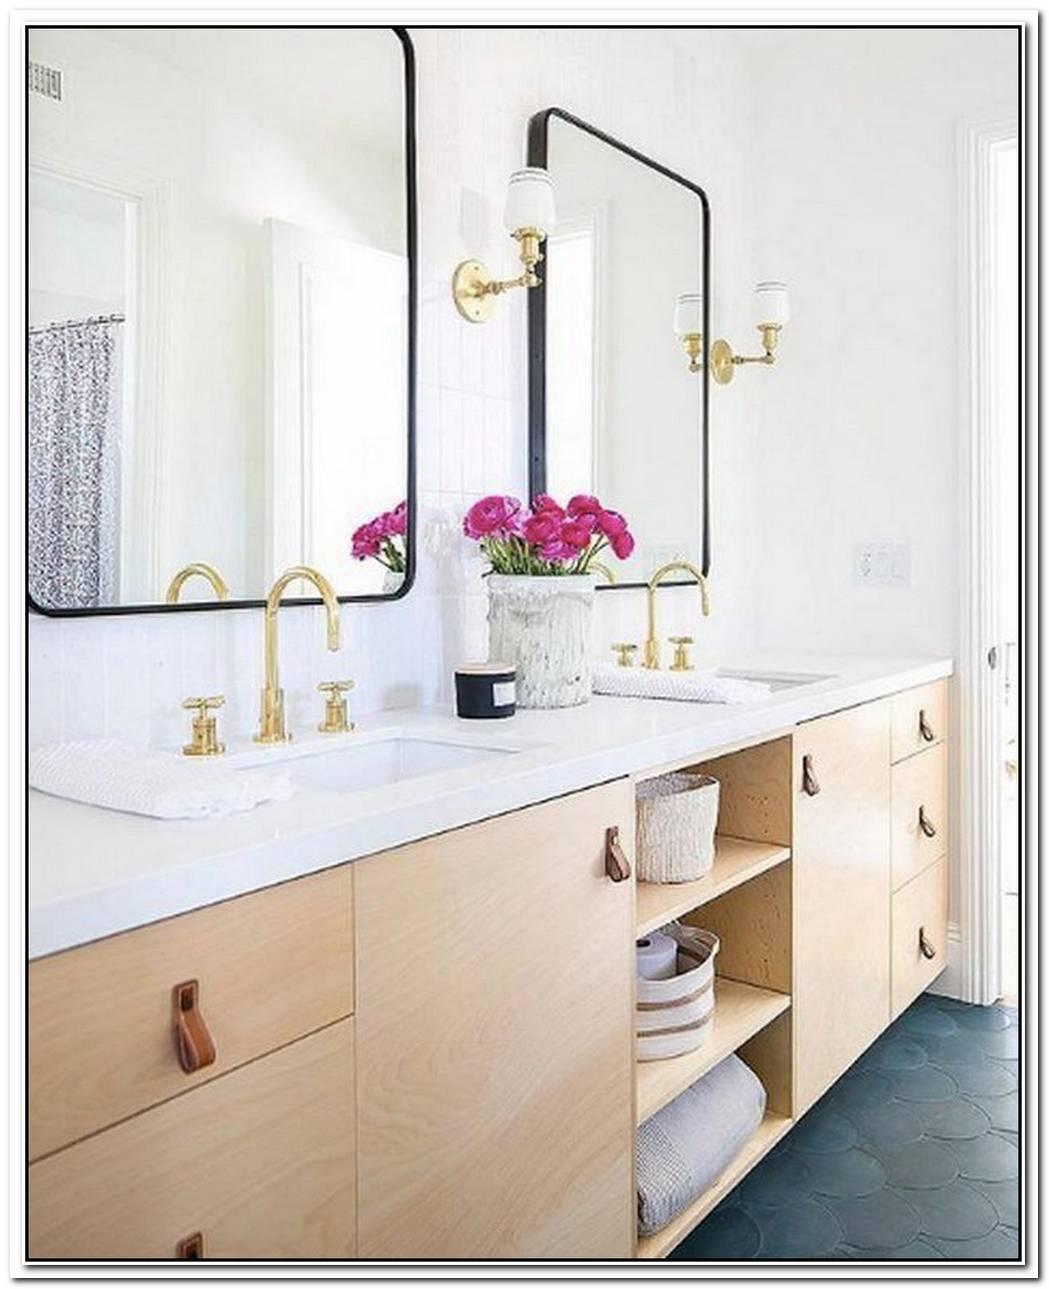 Decorative Details Complete A Clean And Symmetrical Bathroom